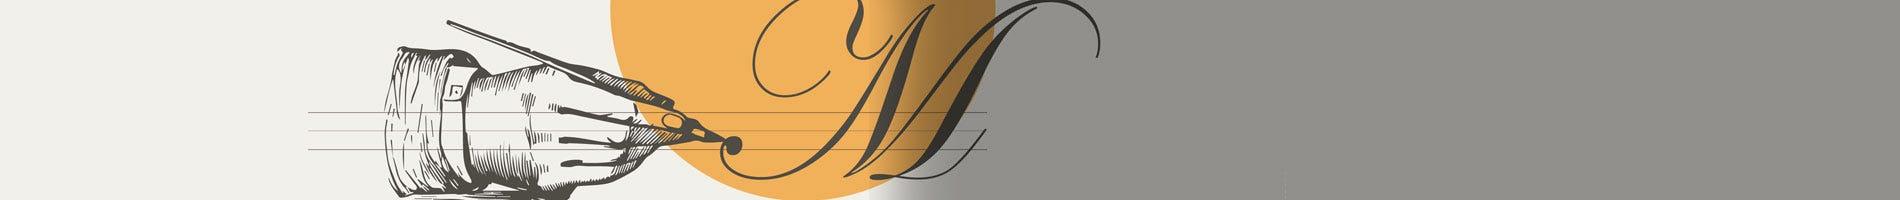 Coles Calligraphy